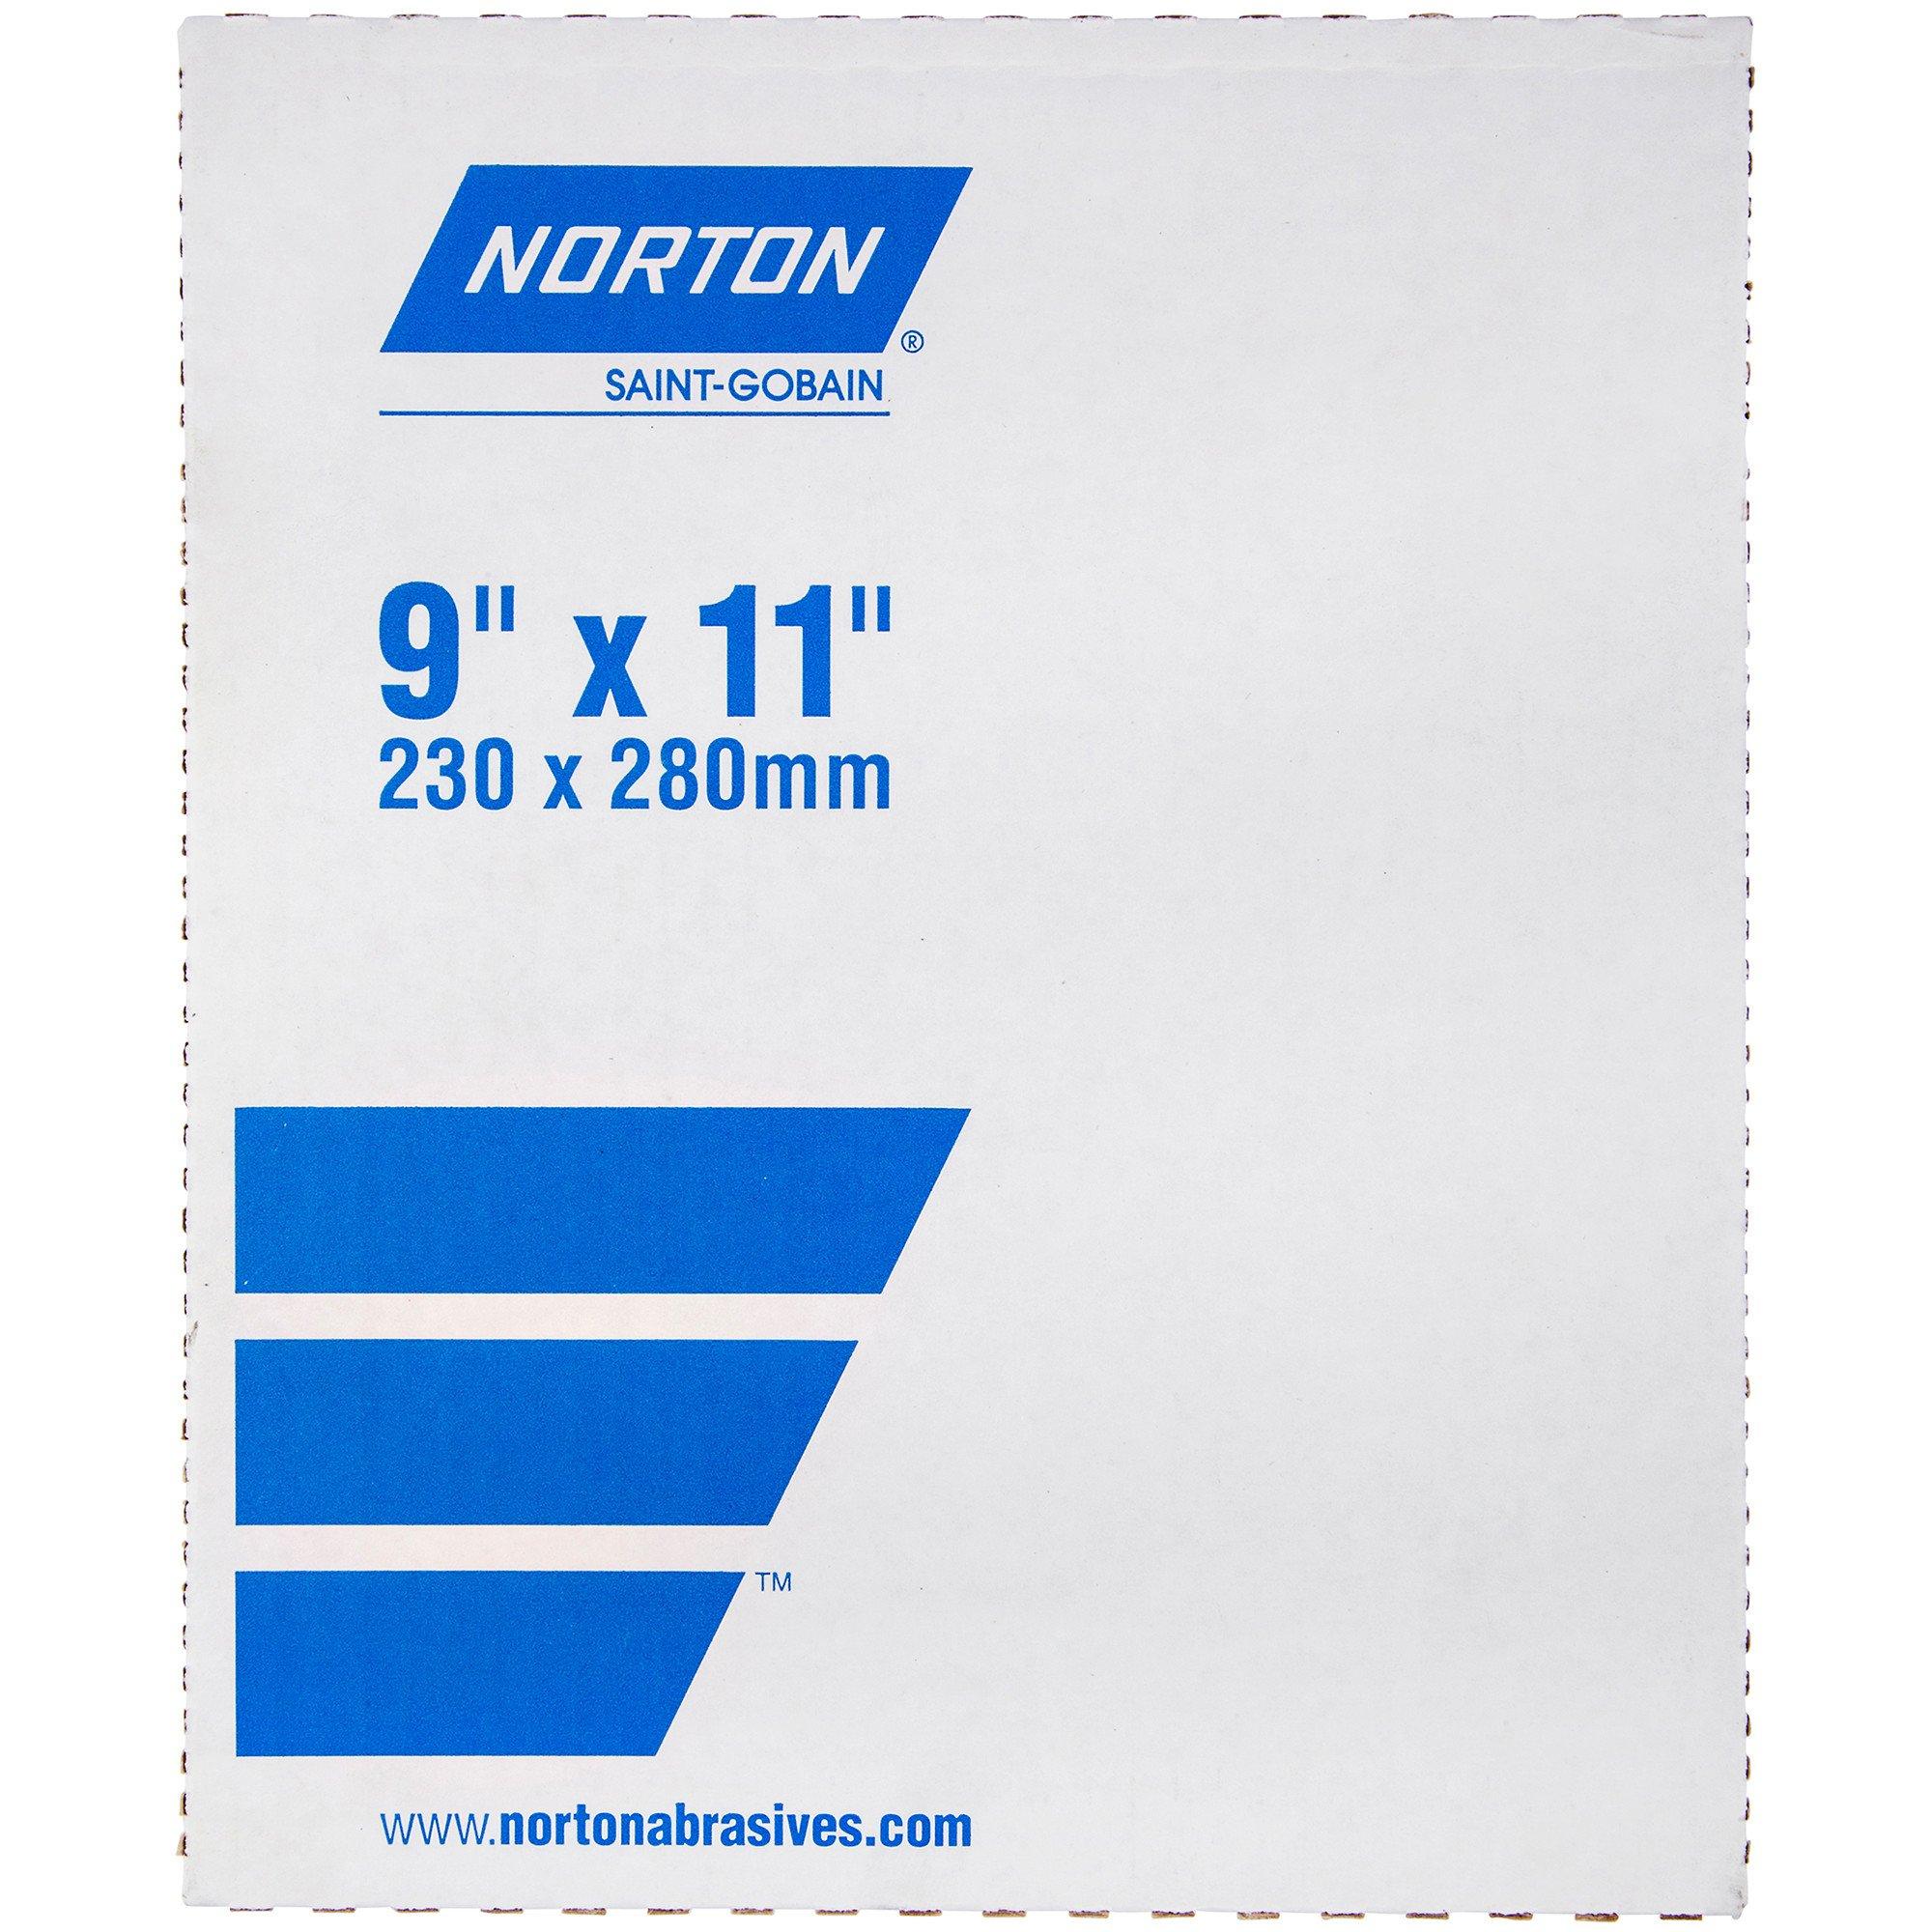 Norton T414 Blue-Bak Abrasive Sheet, Paper Backing, Silicon Carbide, Waterproof, Grit 500  (Pack of 10)